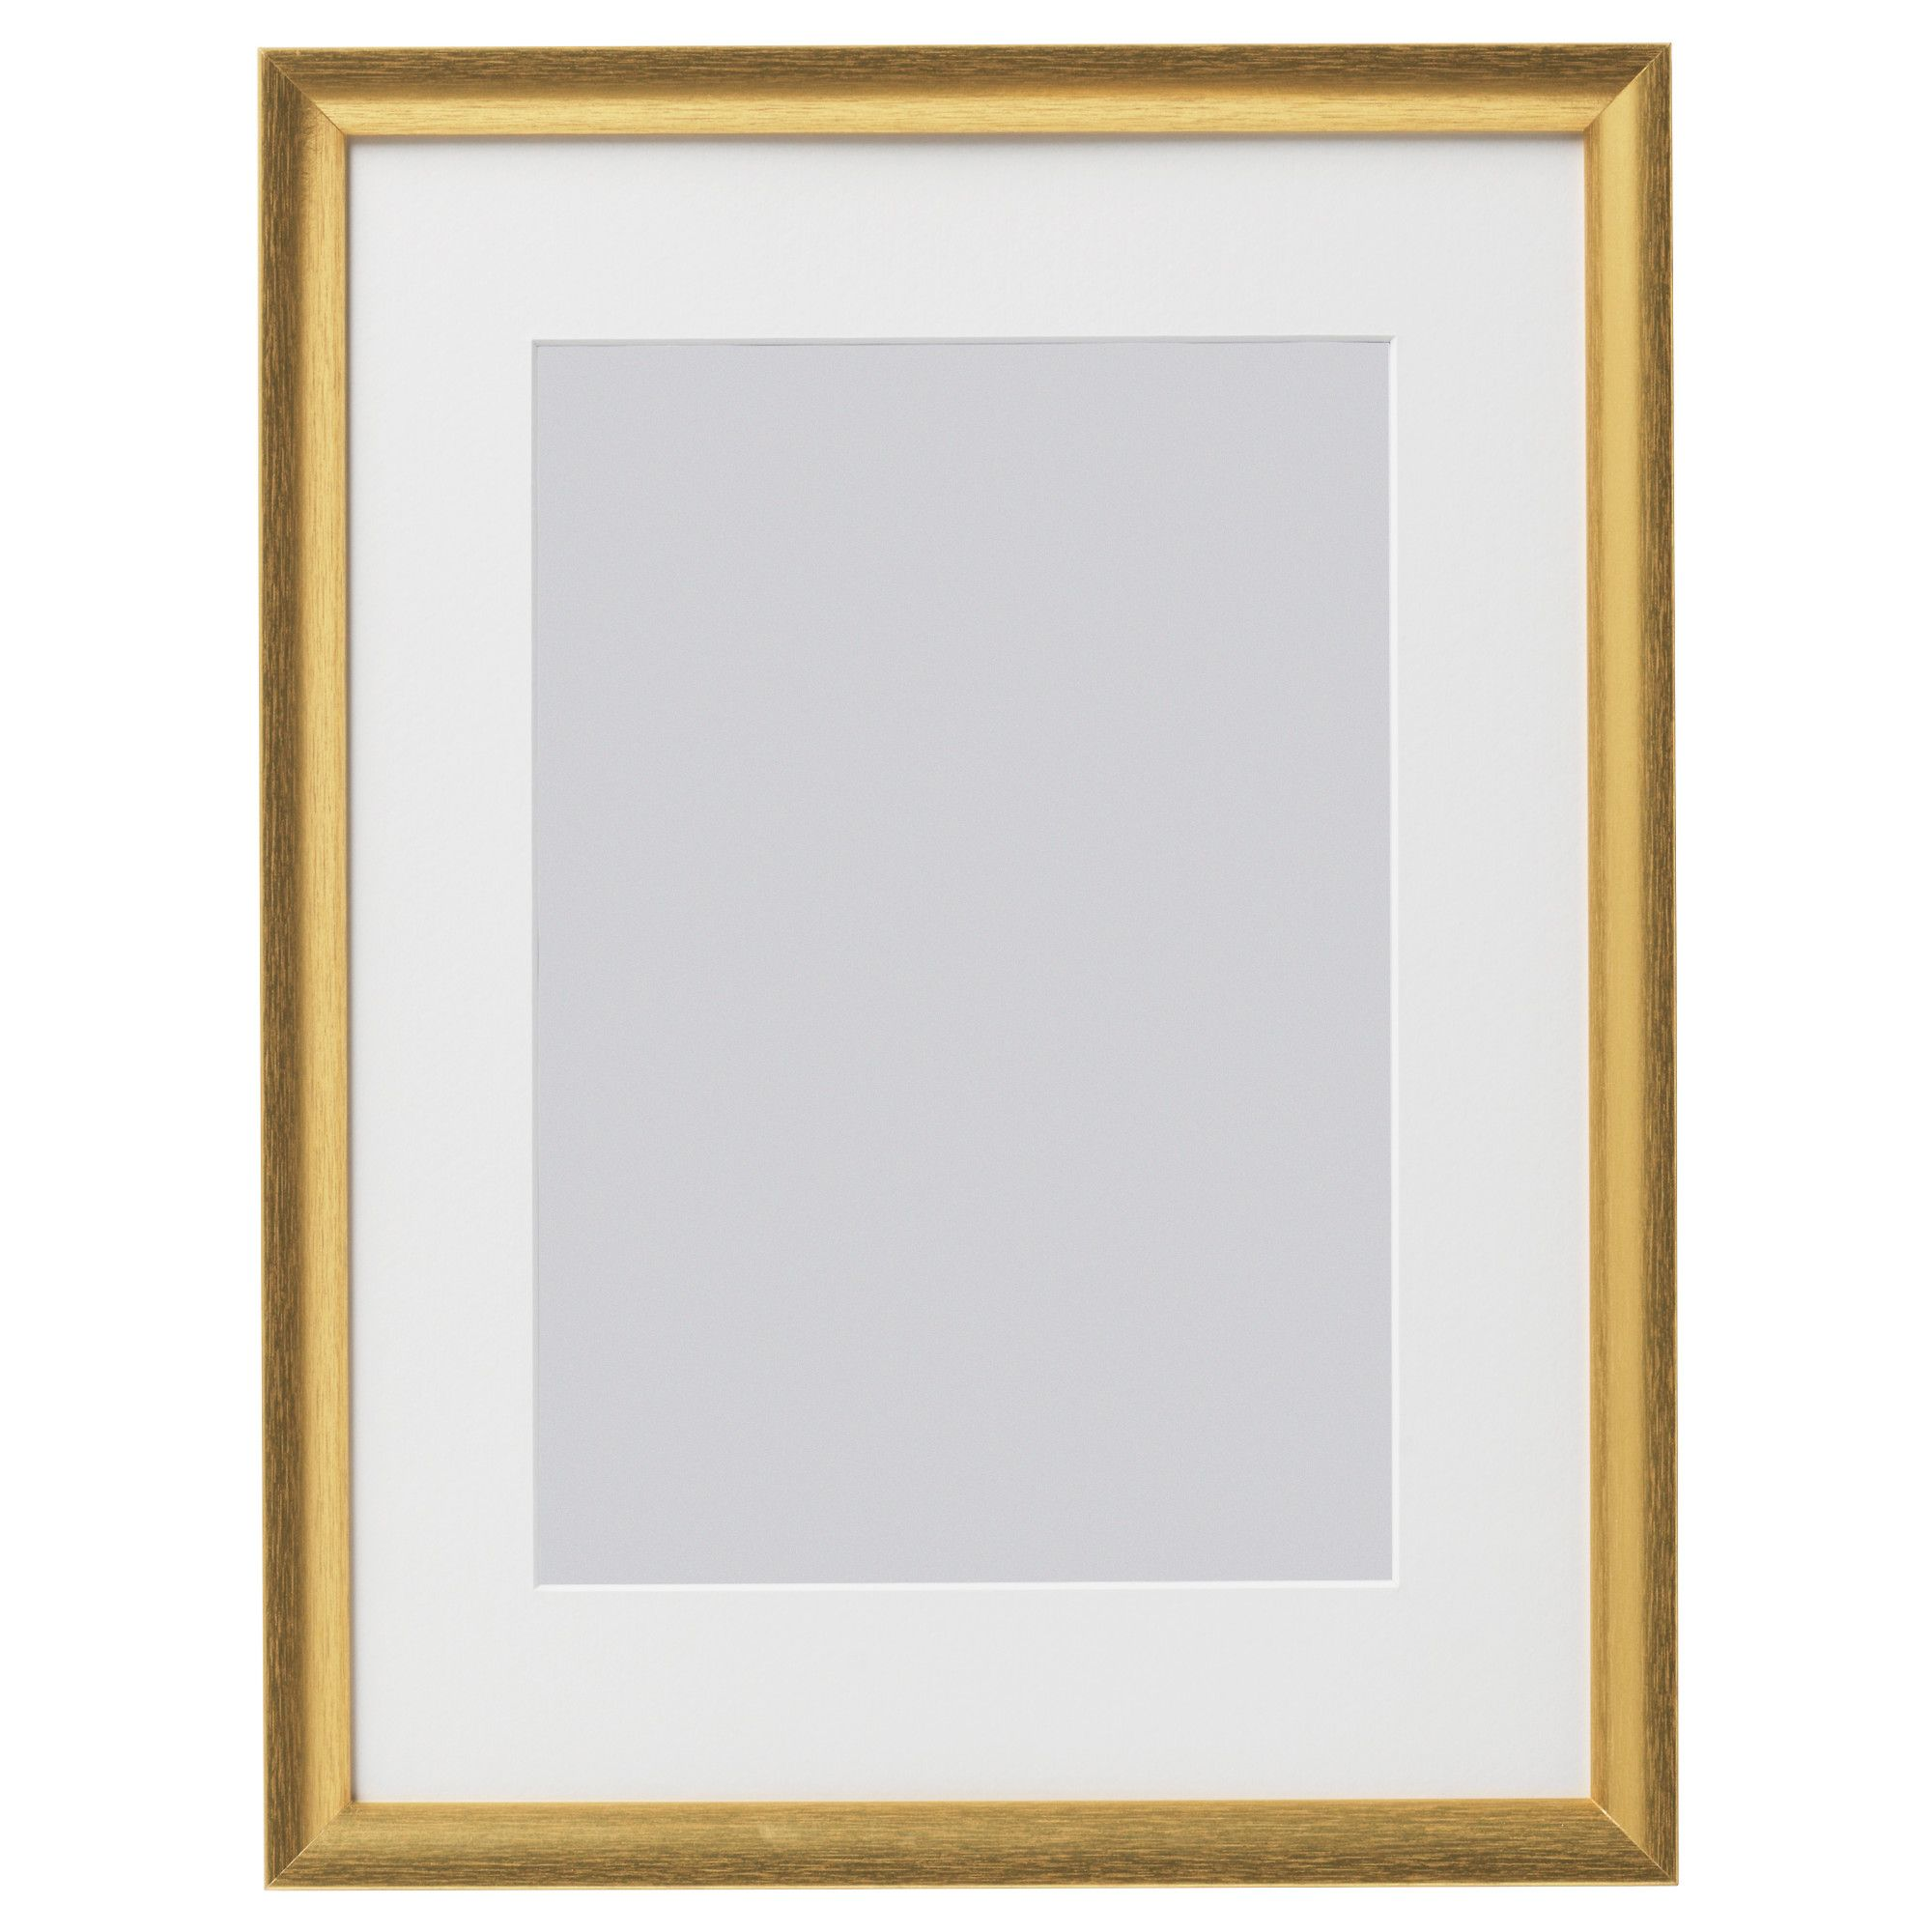 Silverhojden Frame Gold 12x16 Ikea Frame Frames On Wall Wall Frames